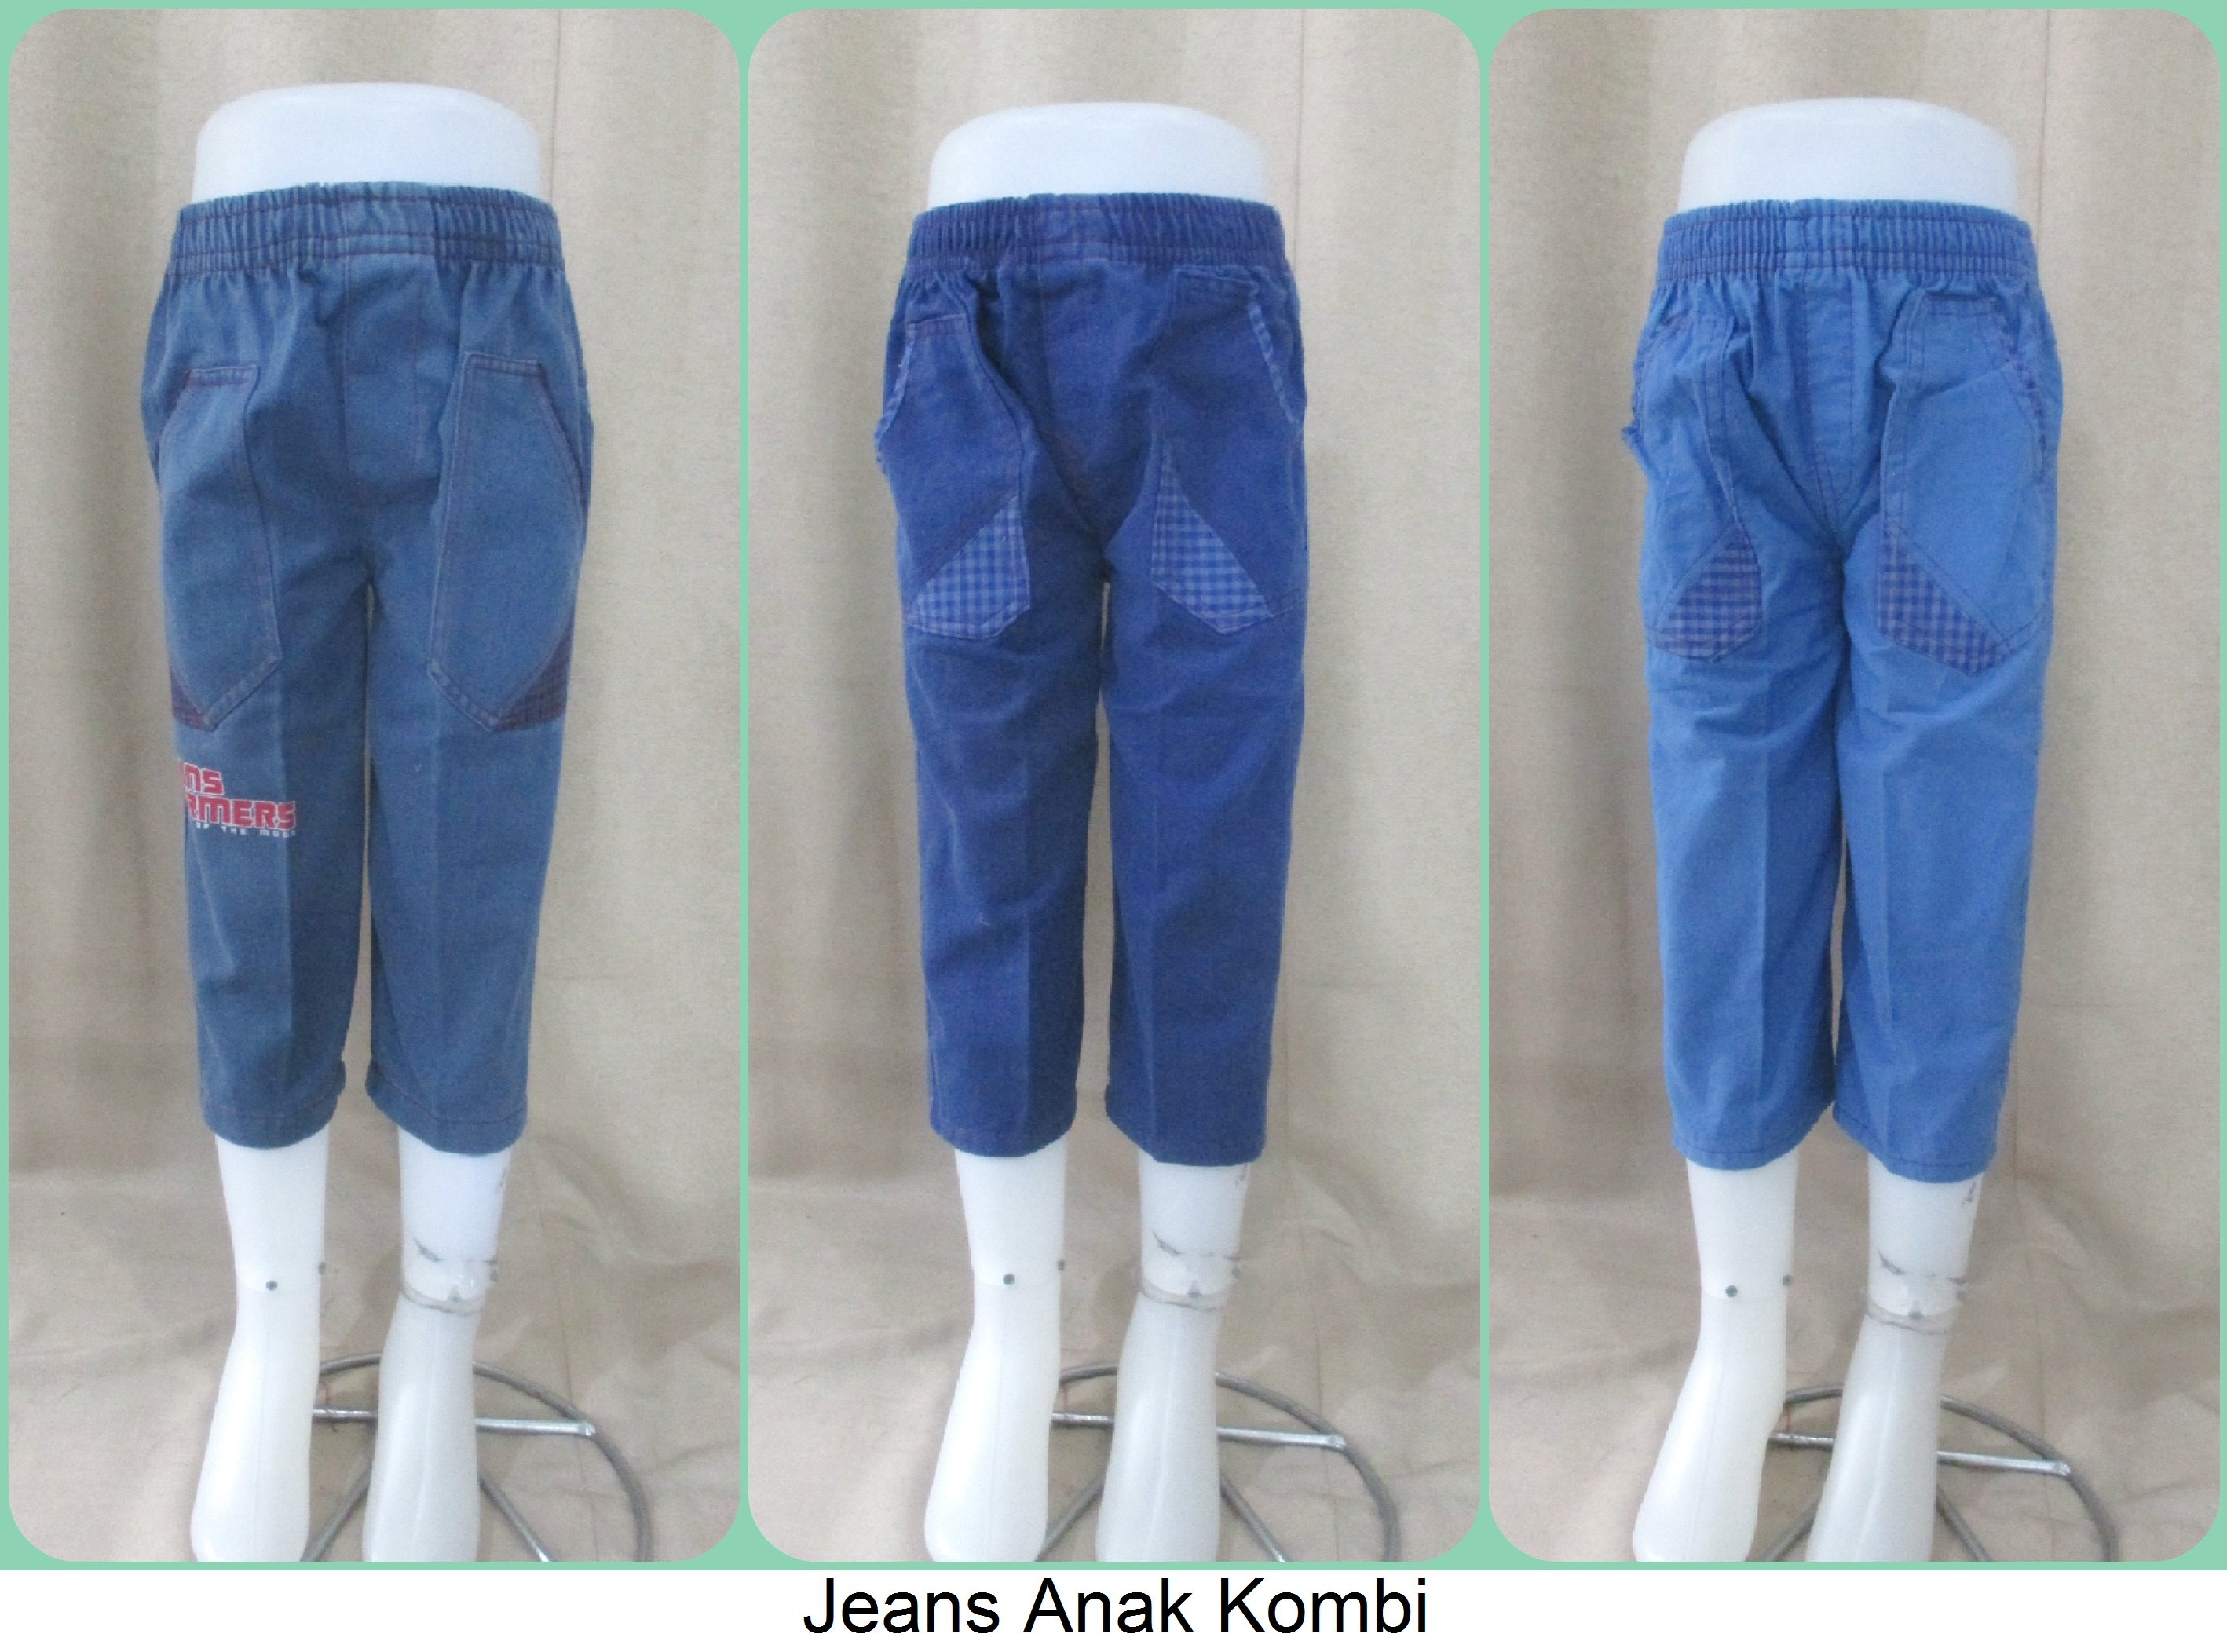 Grosiran Jeans Anak Kombi Termurah Cikarang